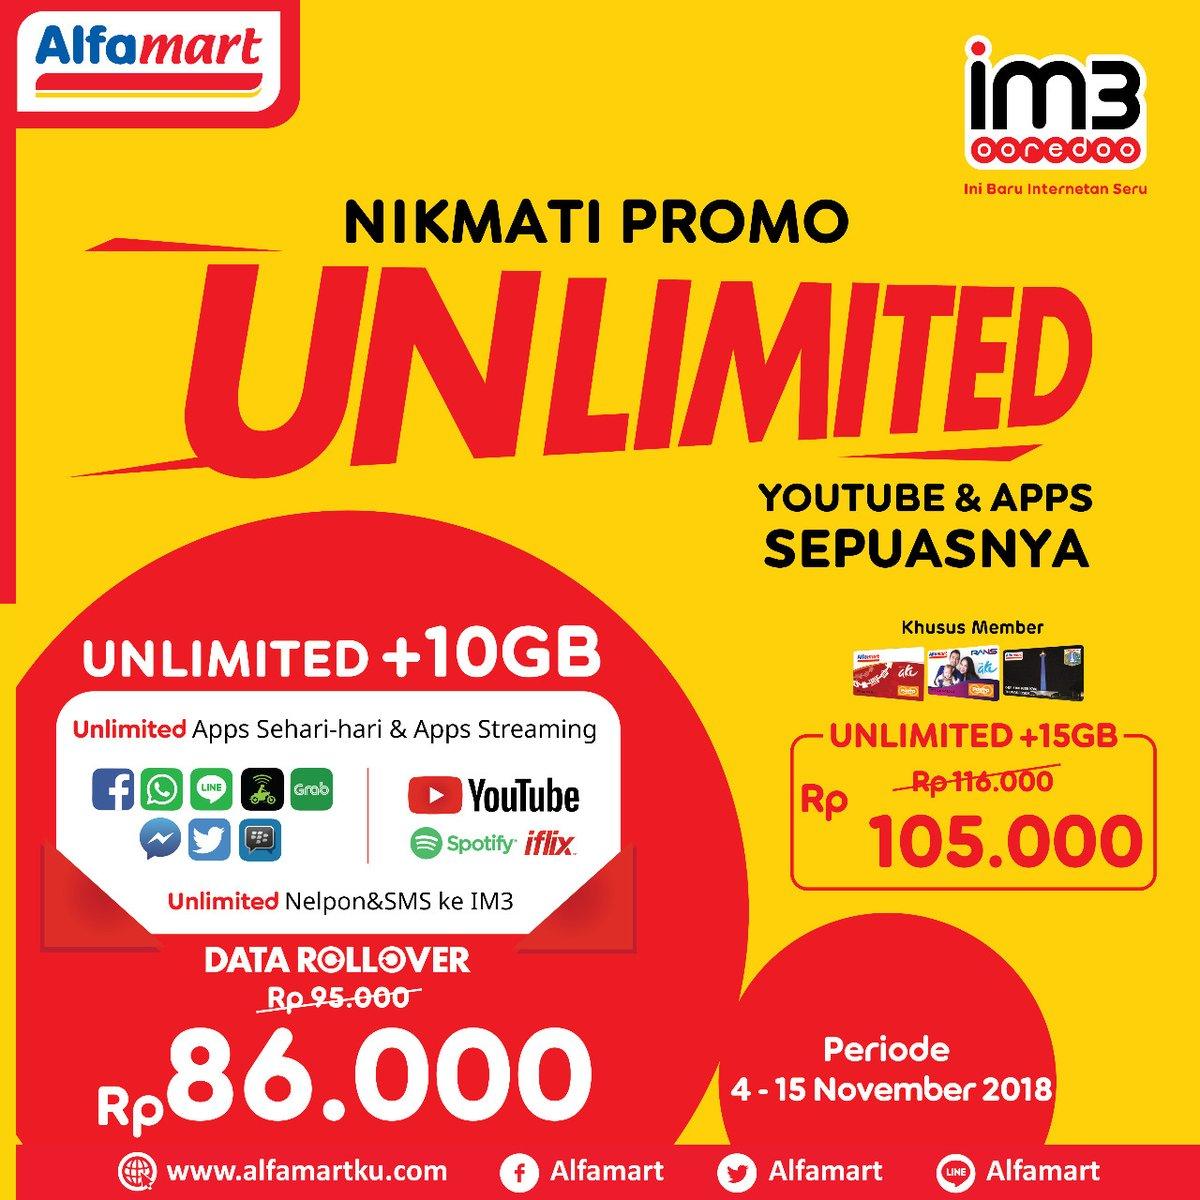 Alfmart - Promo Unlimeted Indosat Youtube Sepuasnya Mulai 86 Ribu (s.d 15 Nov 2018)